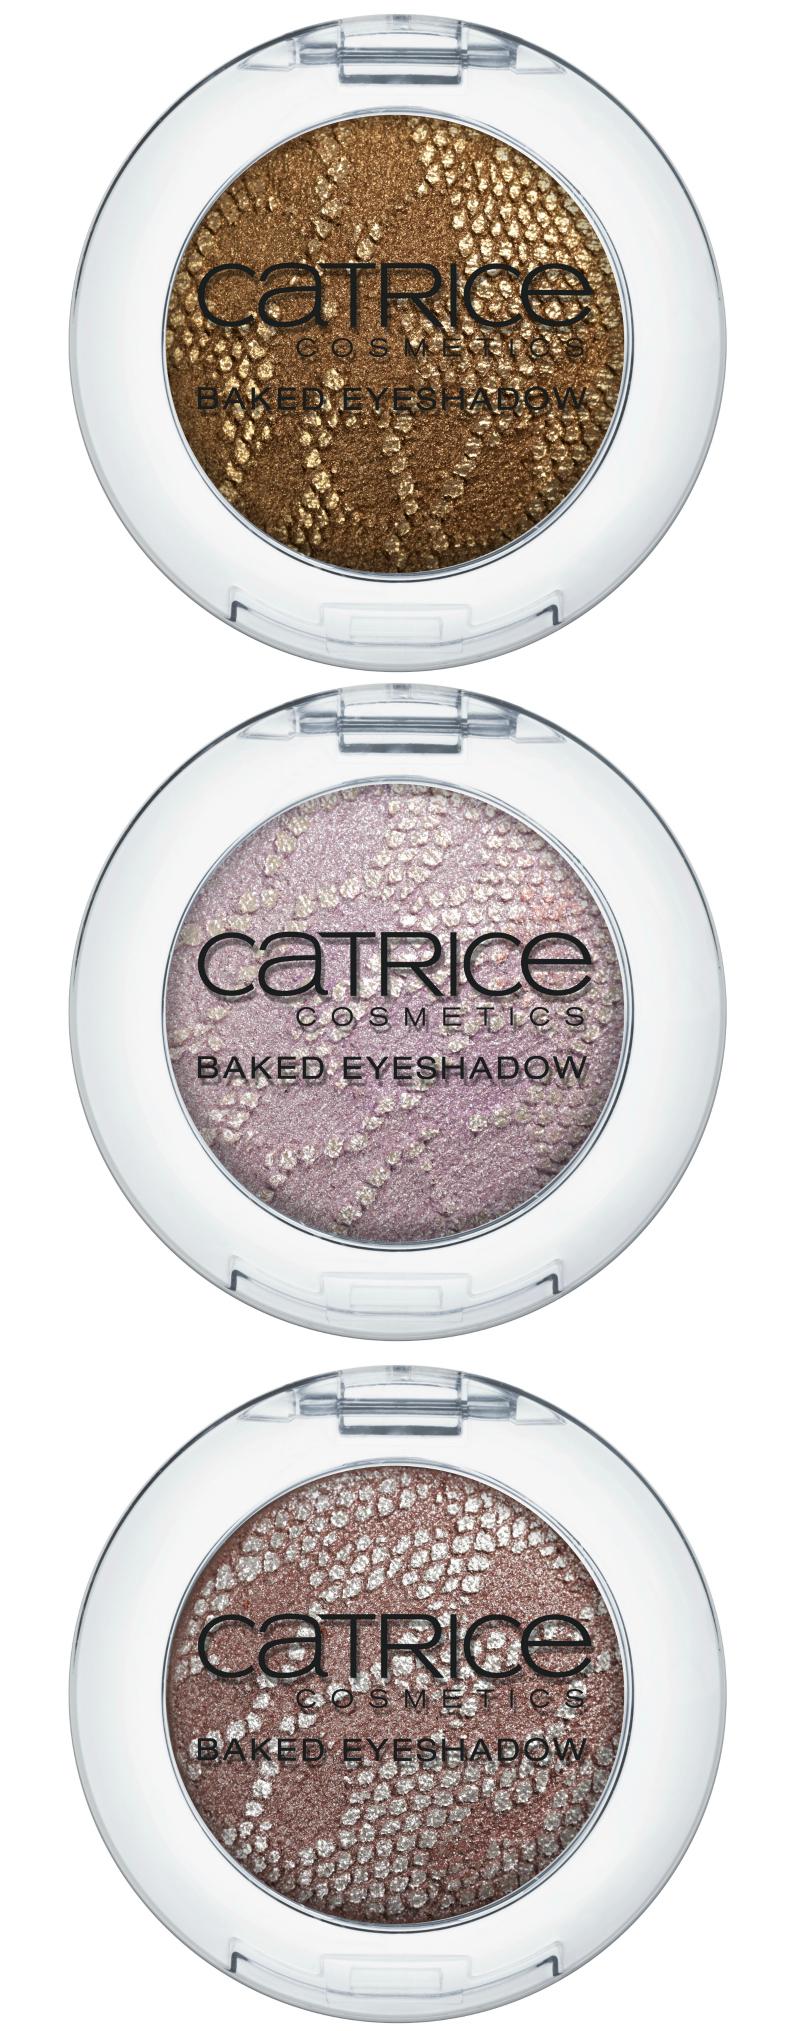 Catrice-Viennartlimited-edition